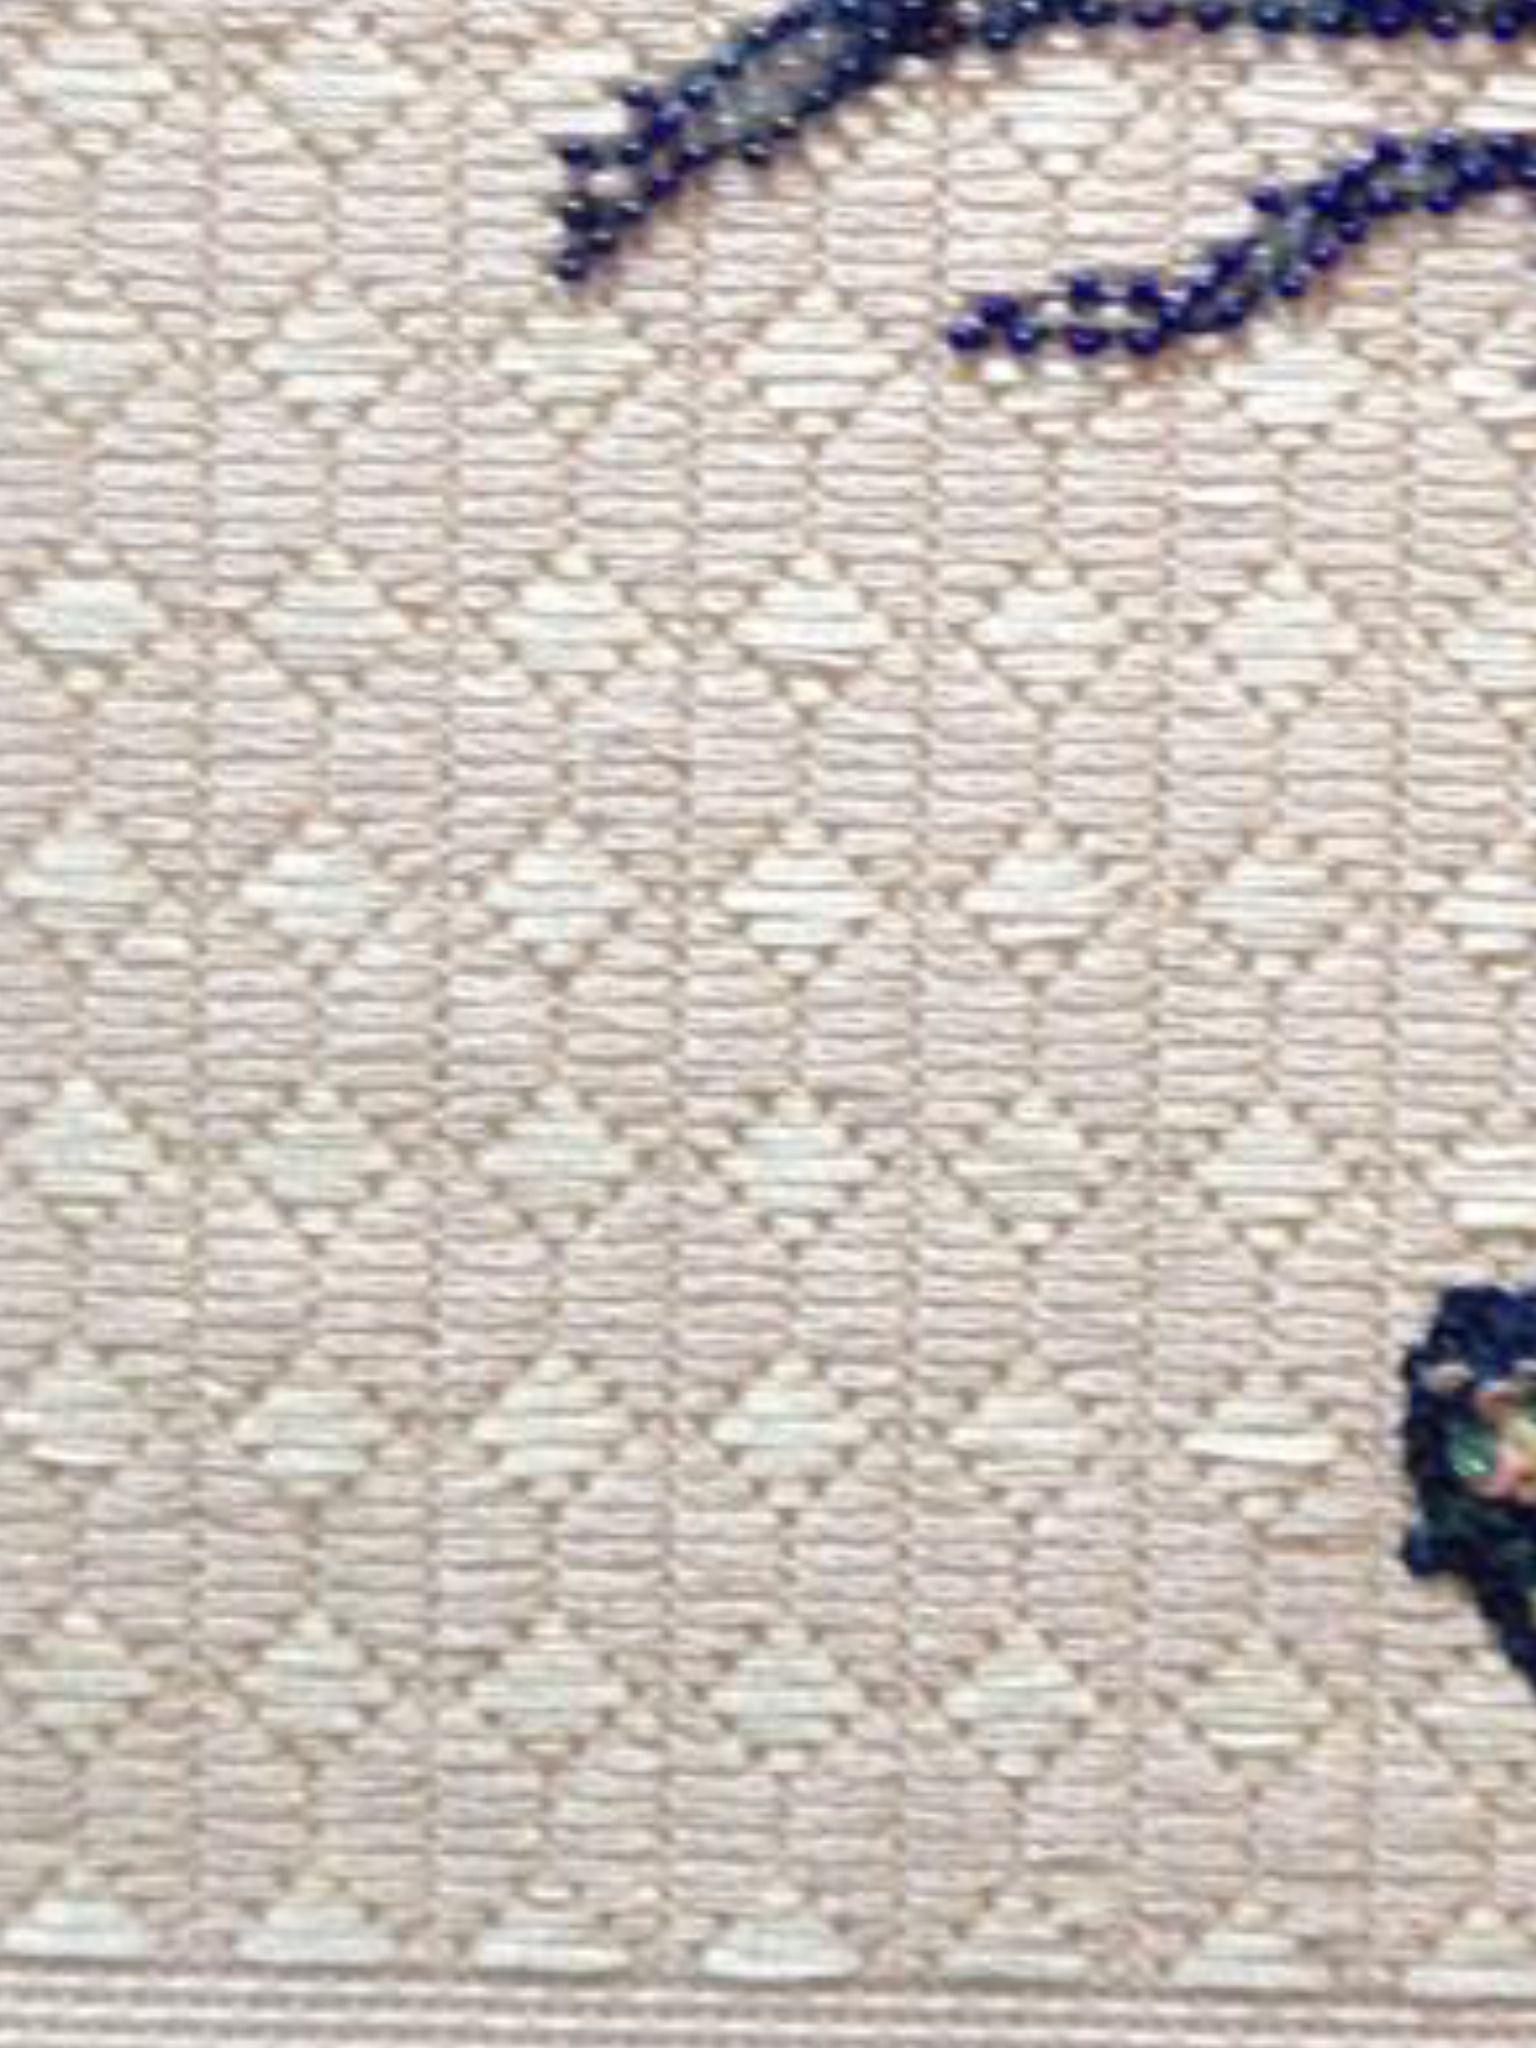 Great background stitch